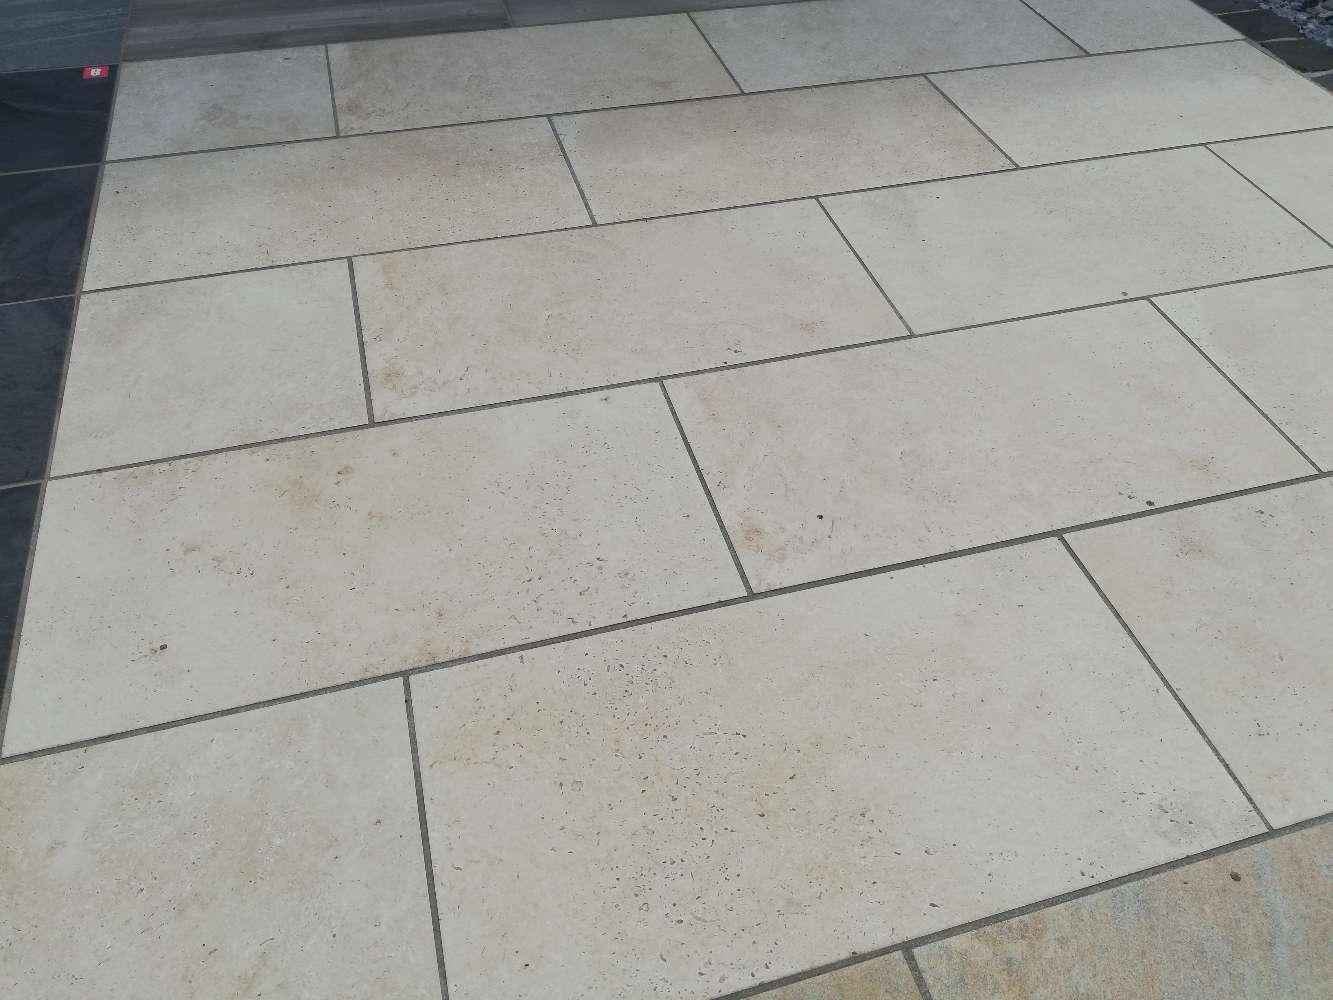 Keramik Terrassenplatte 40/80/2+2 mit Betonkern